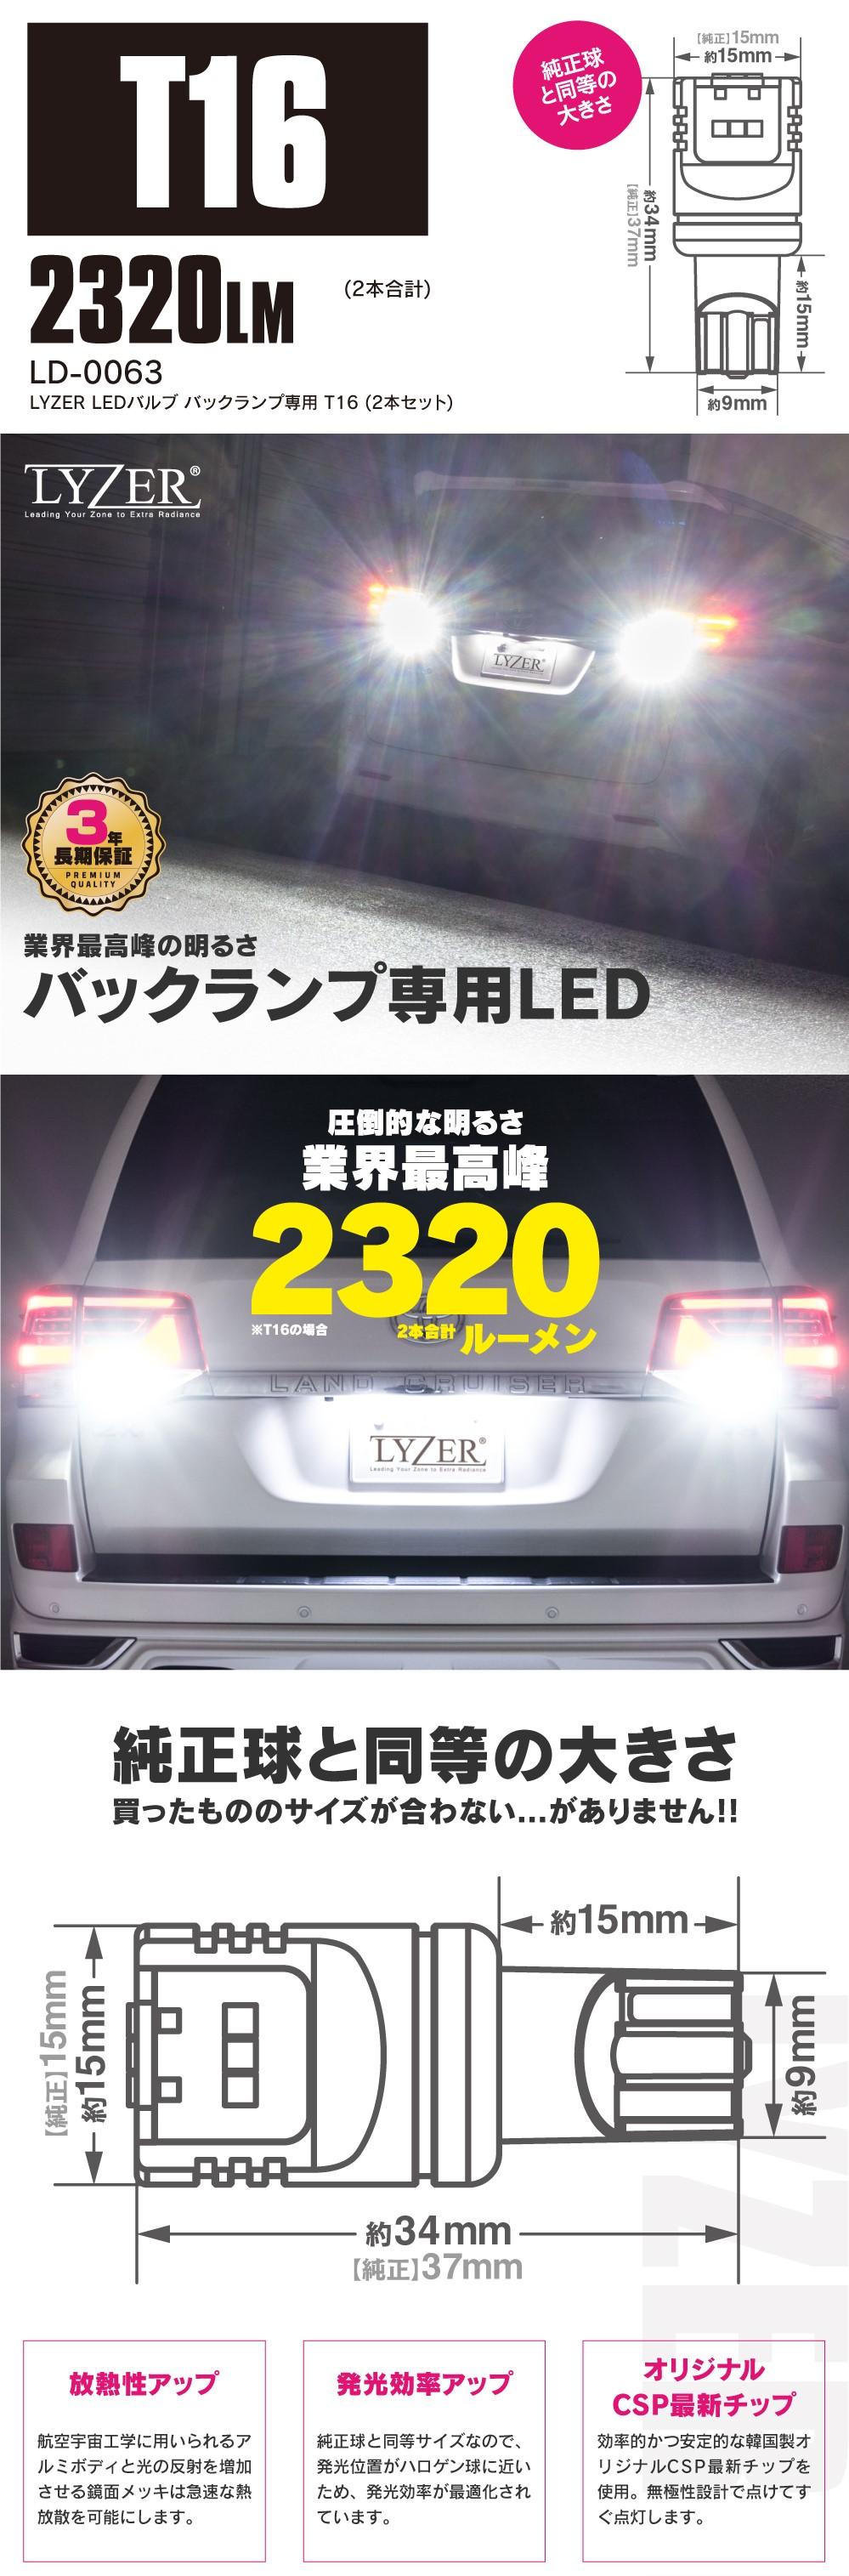 LYZER LEDバルブ バックランプ専用 T16商品説明画像